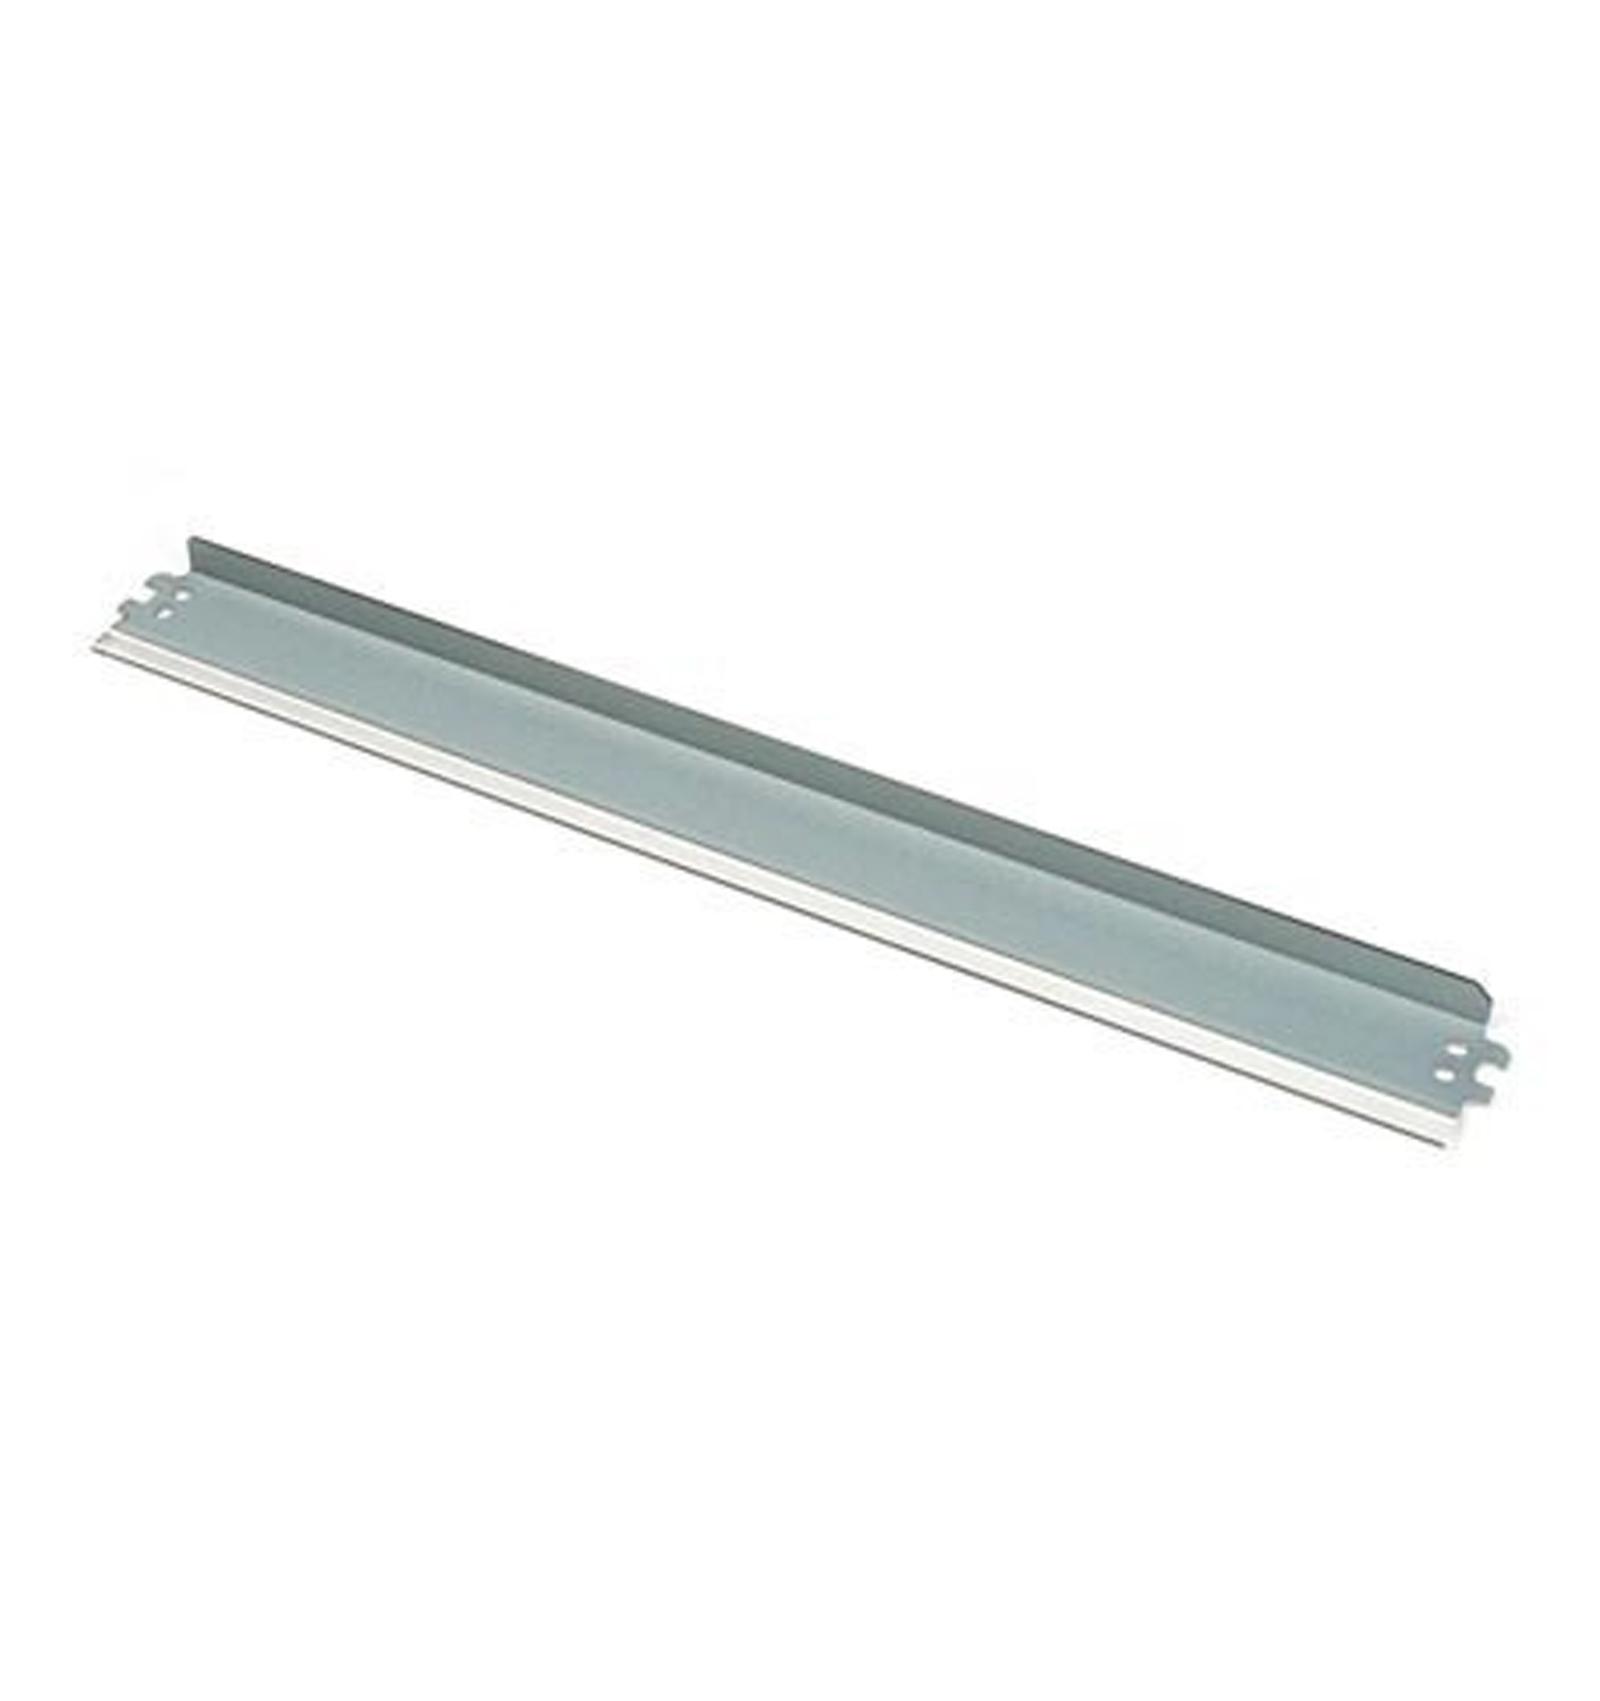 Замена ракеля картриджа HP Q2612A (12A) для LaserJet 1010/1018/1020/1022/3050/3055/M1005 mfp/M1319 mfp